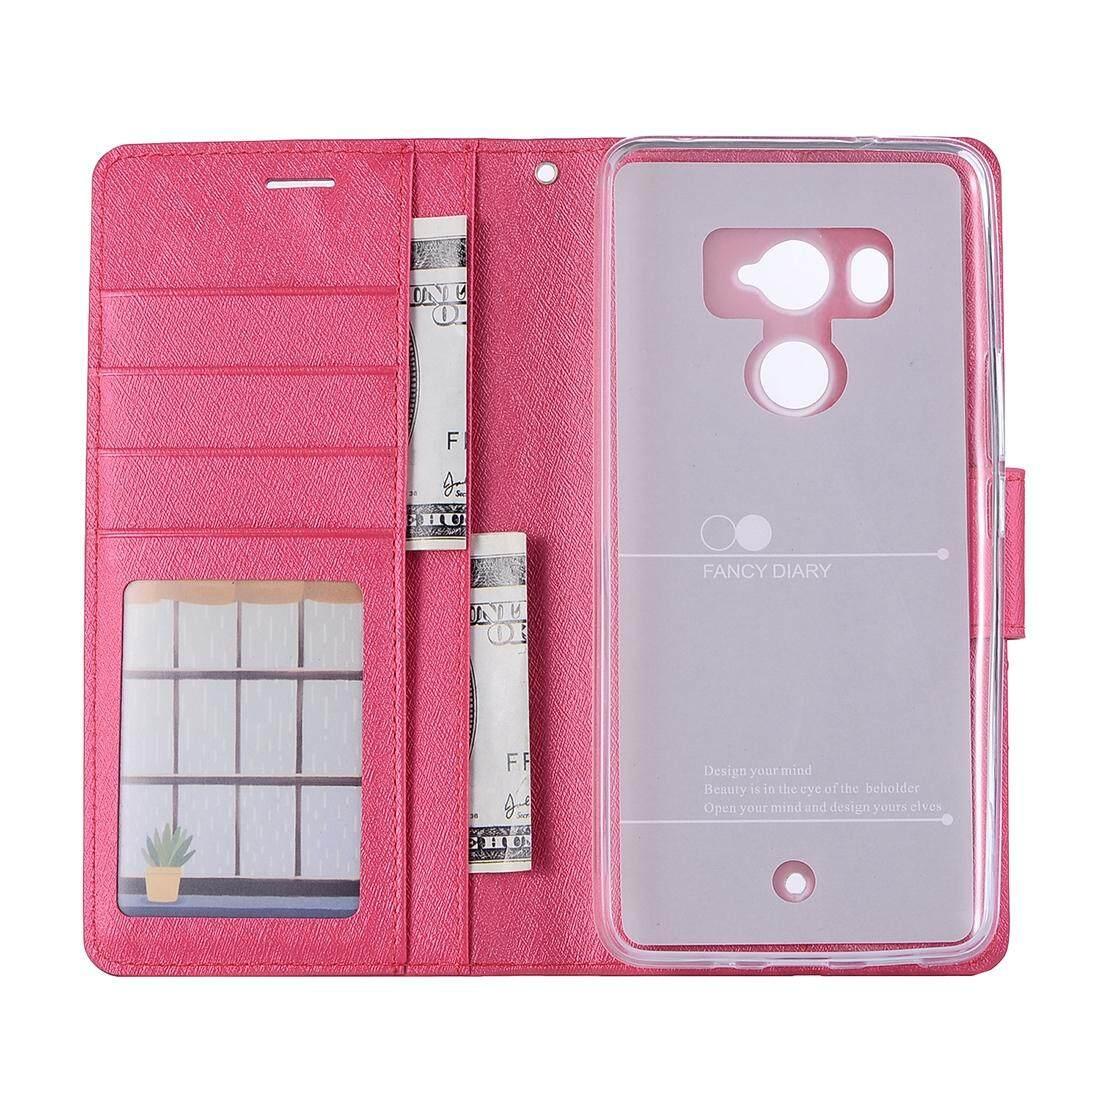 Merah Source · Motomo Samsung Galaxy Mega 2 G7508 Hardcase Backcase Metal Case . Source ·